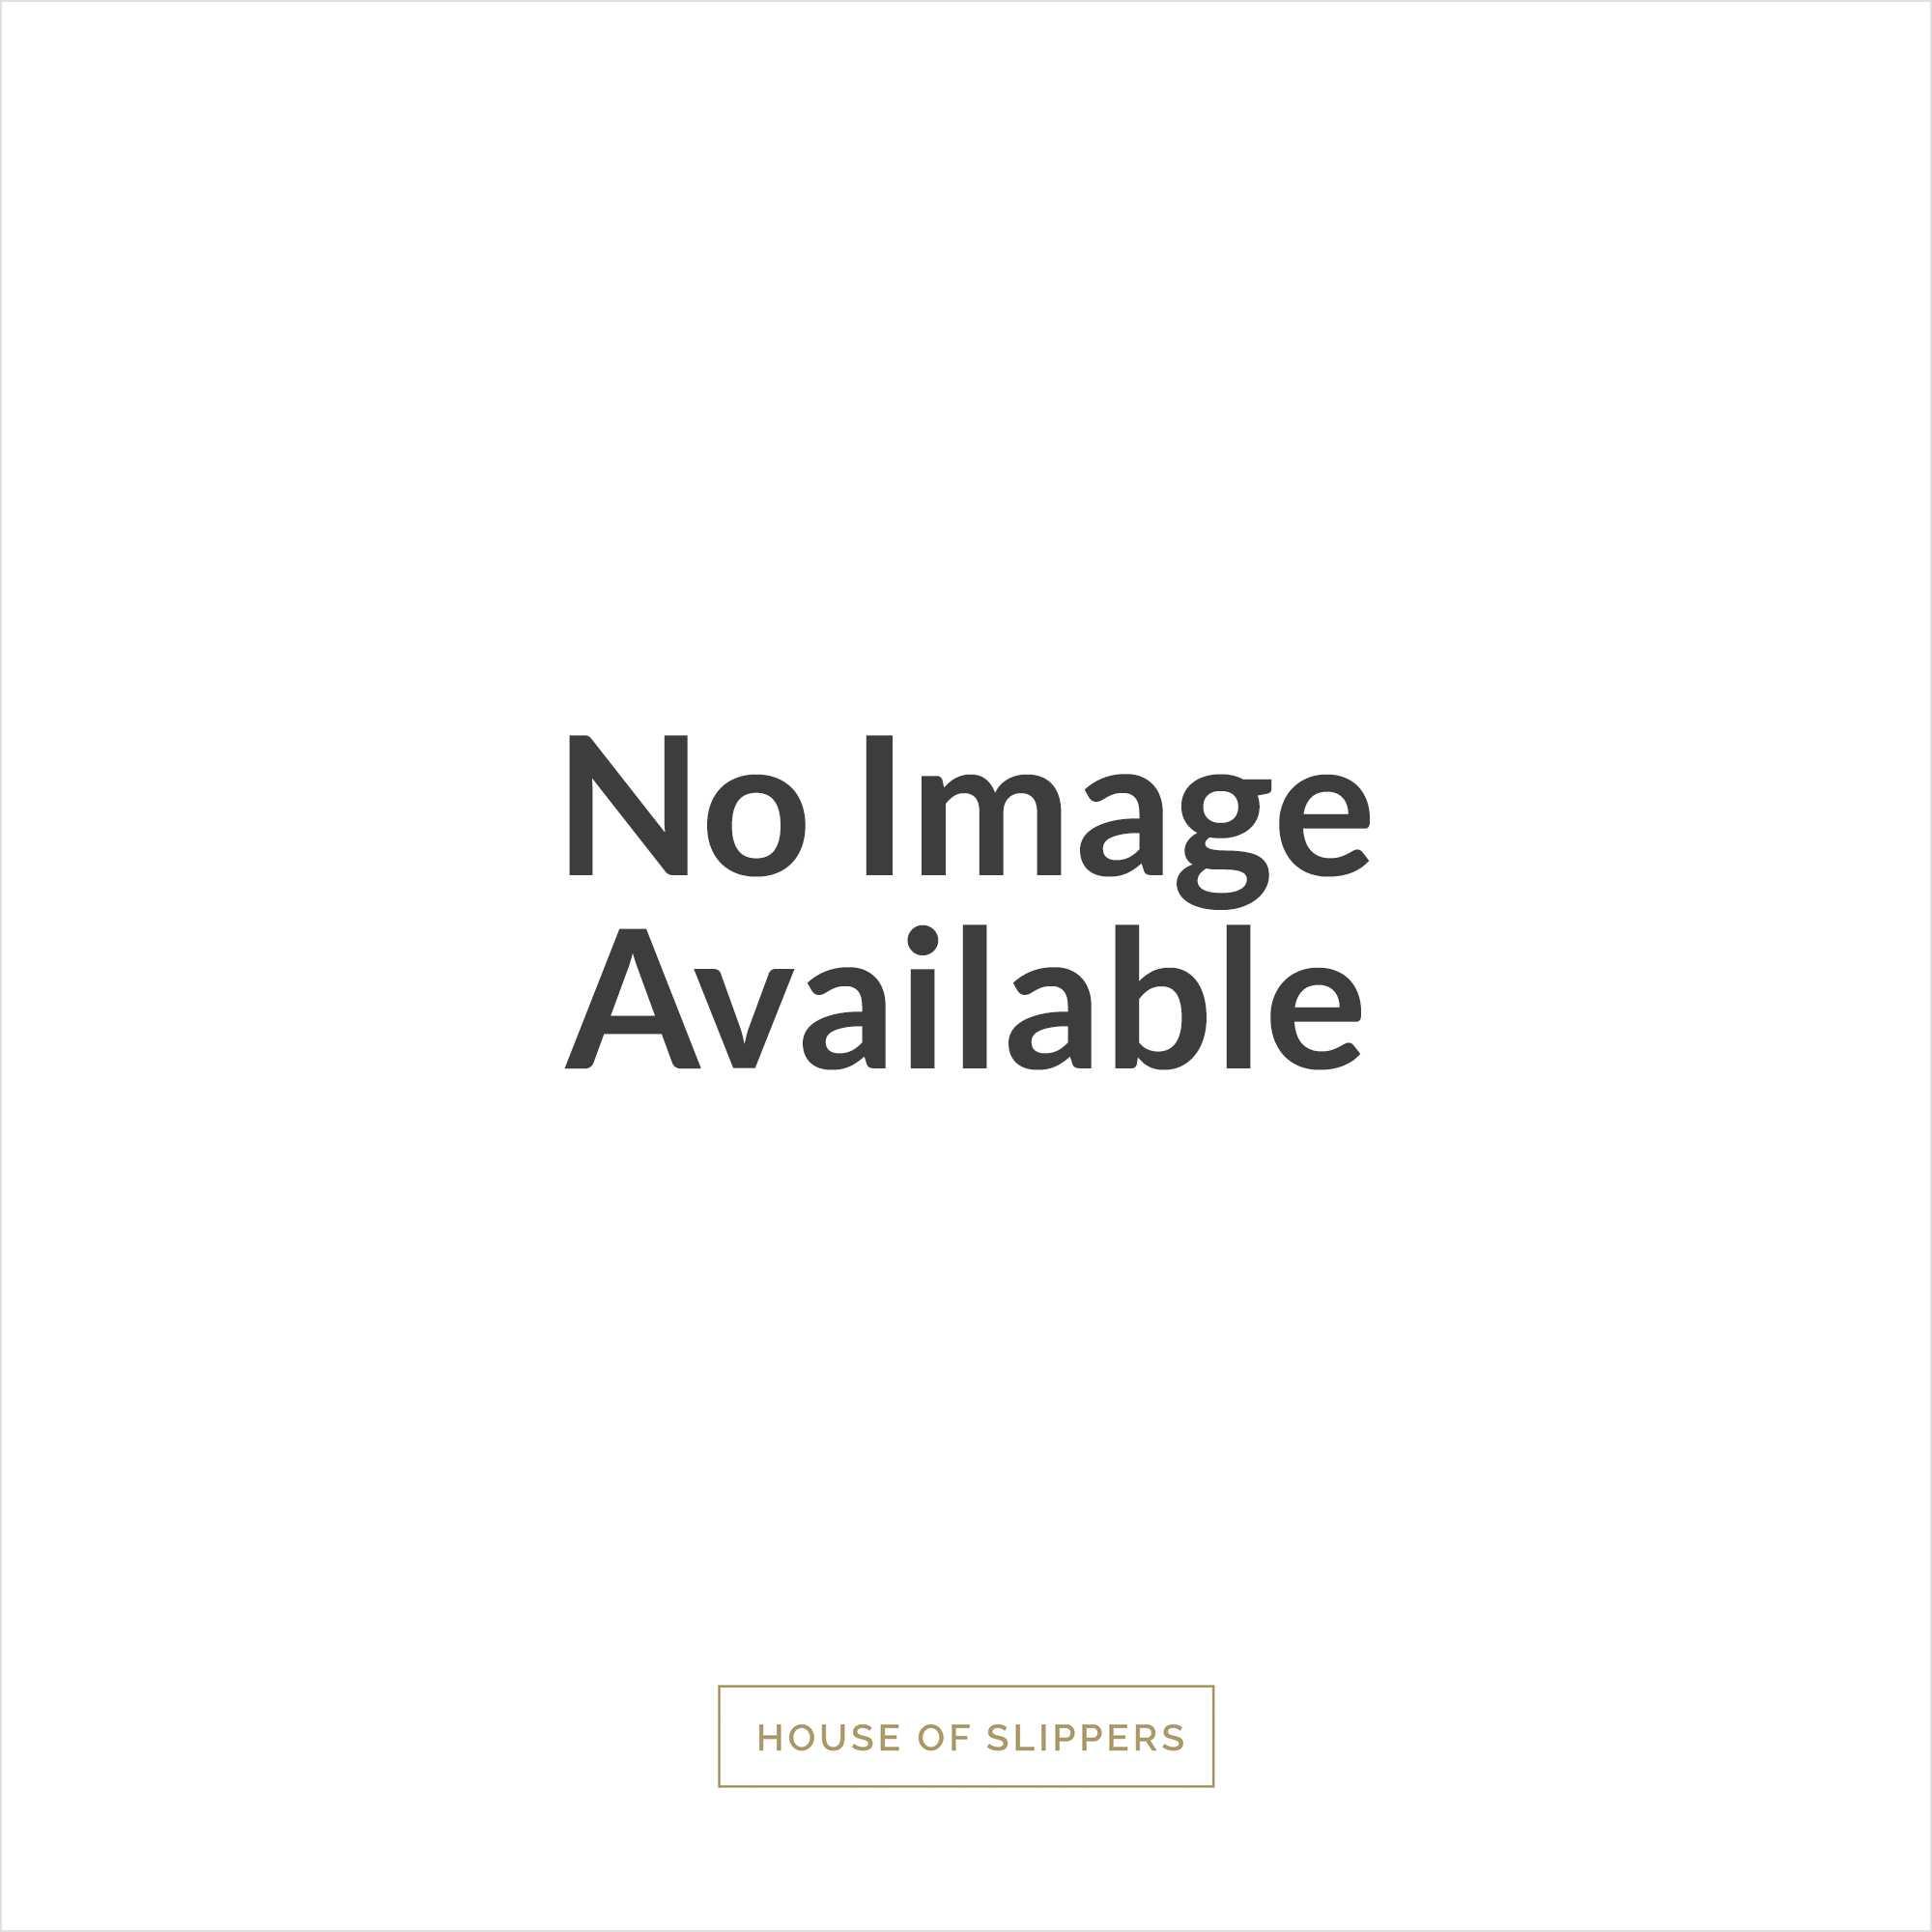 f9cb9ad8728c UGG FLUFF YEAH SLIDE Ladies Slide Slippers Seashell Pink. £120.00£100.00.  MIRABELLE Ladies Mule Slippers Amberlight